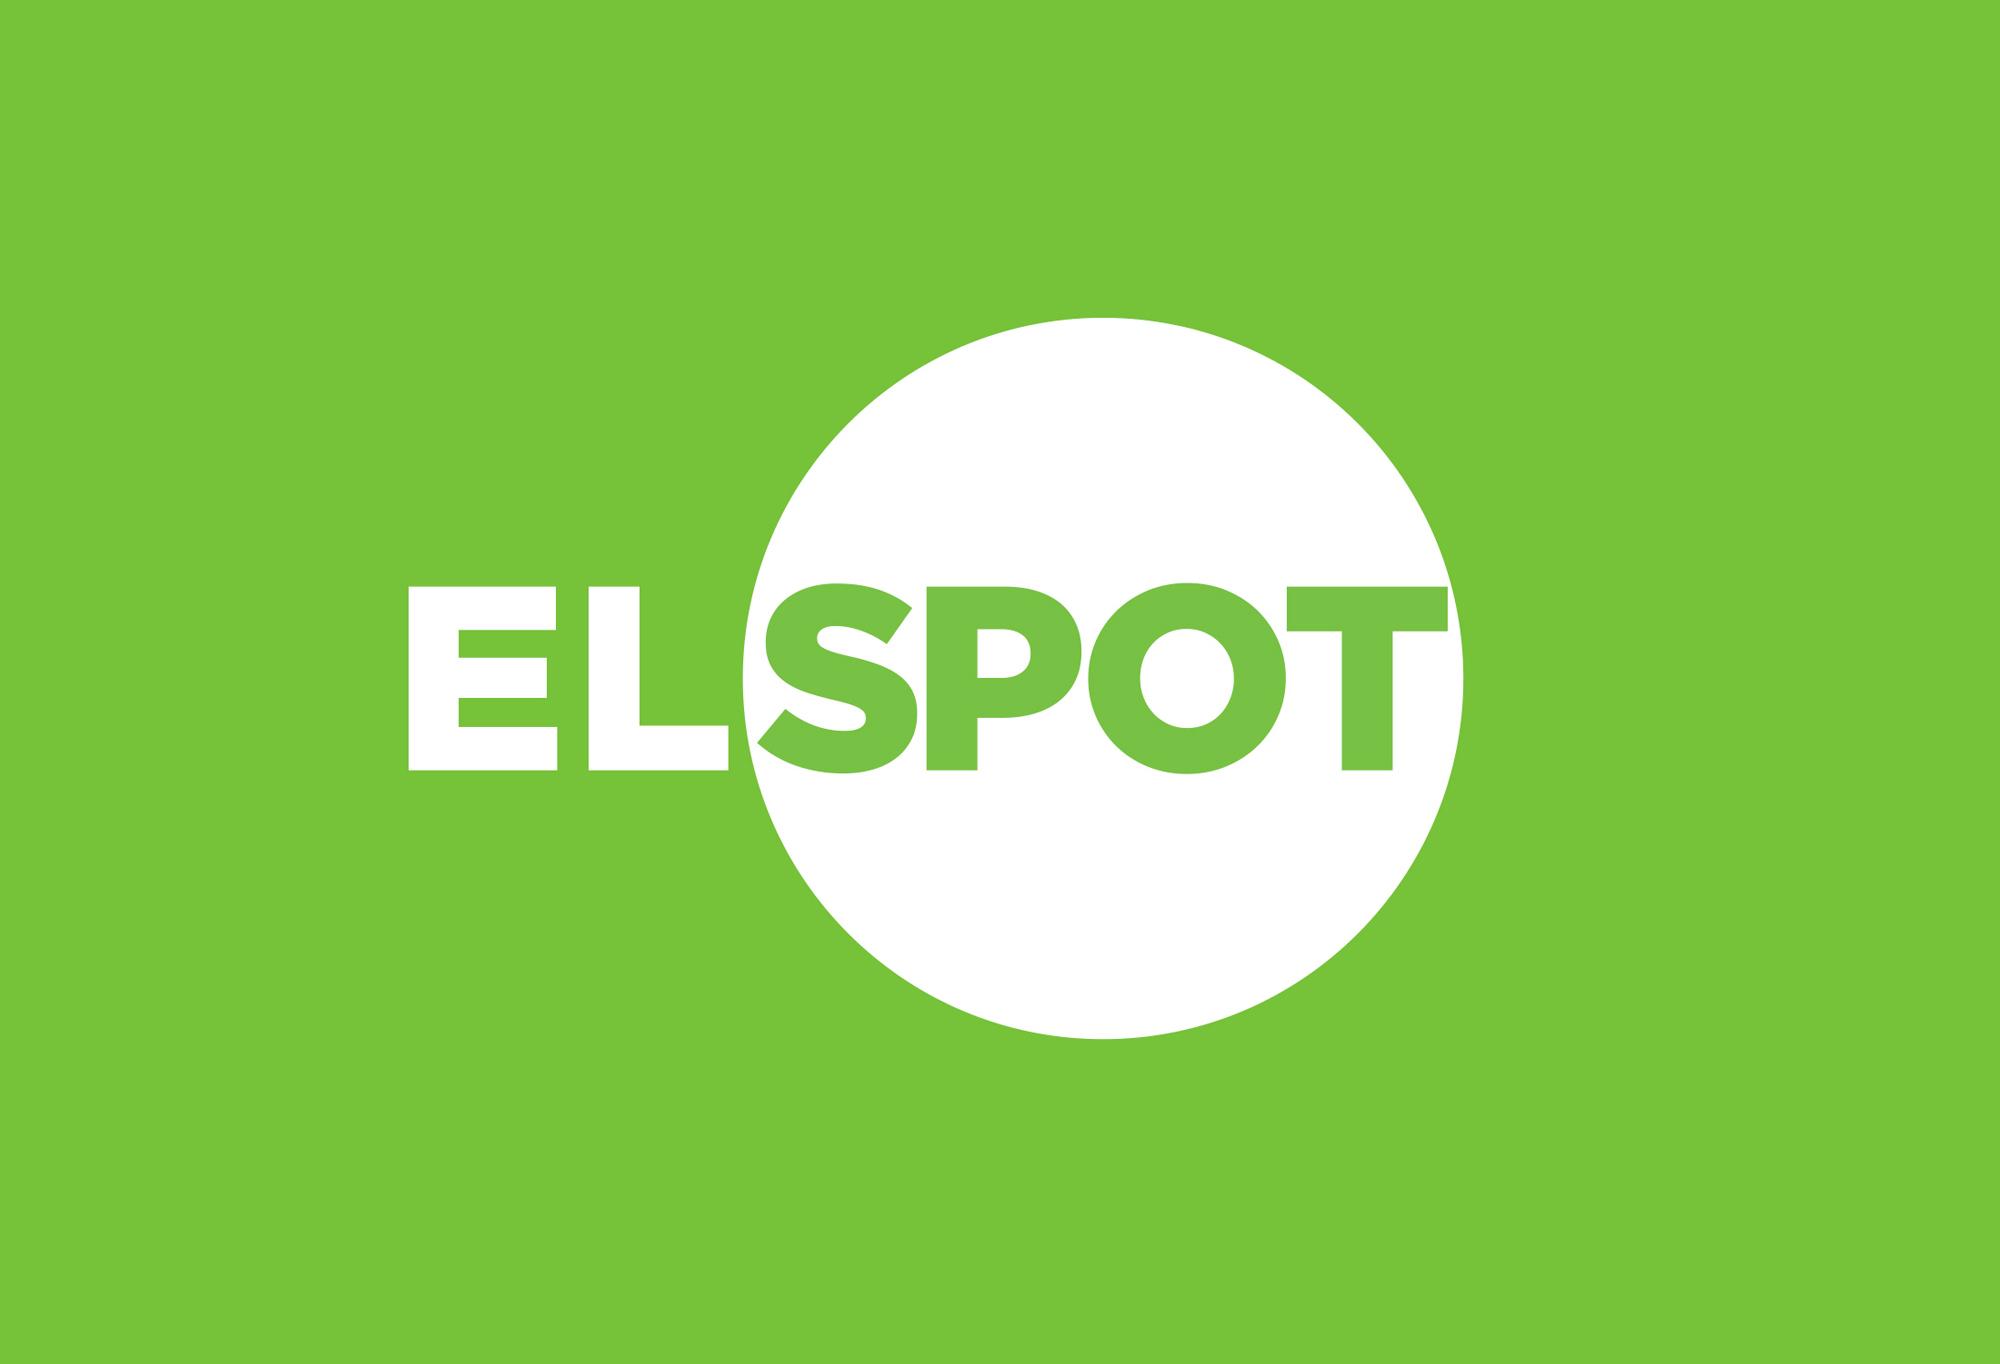 Logo Design Elspot